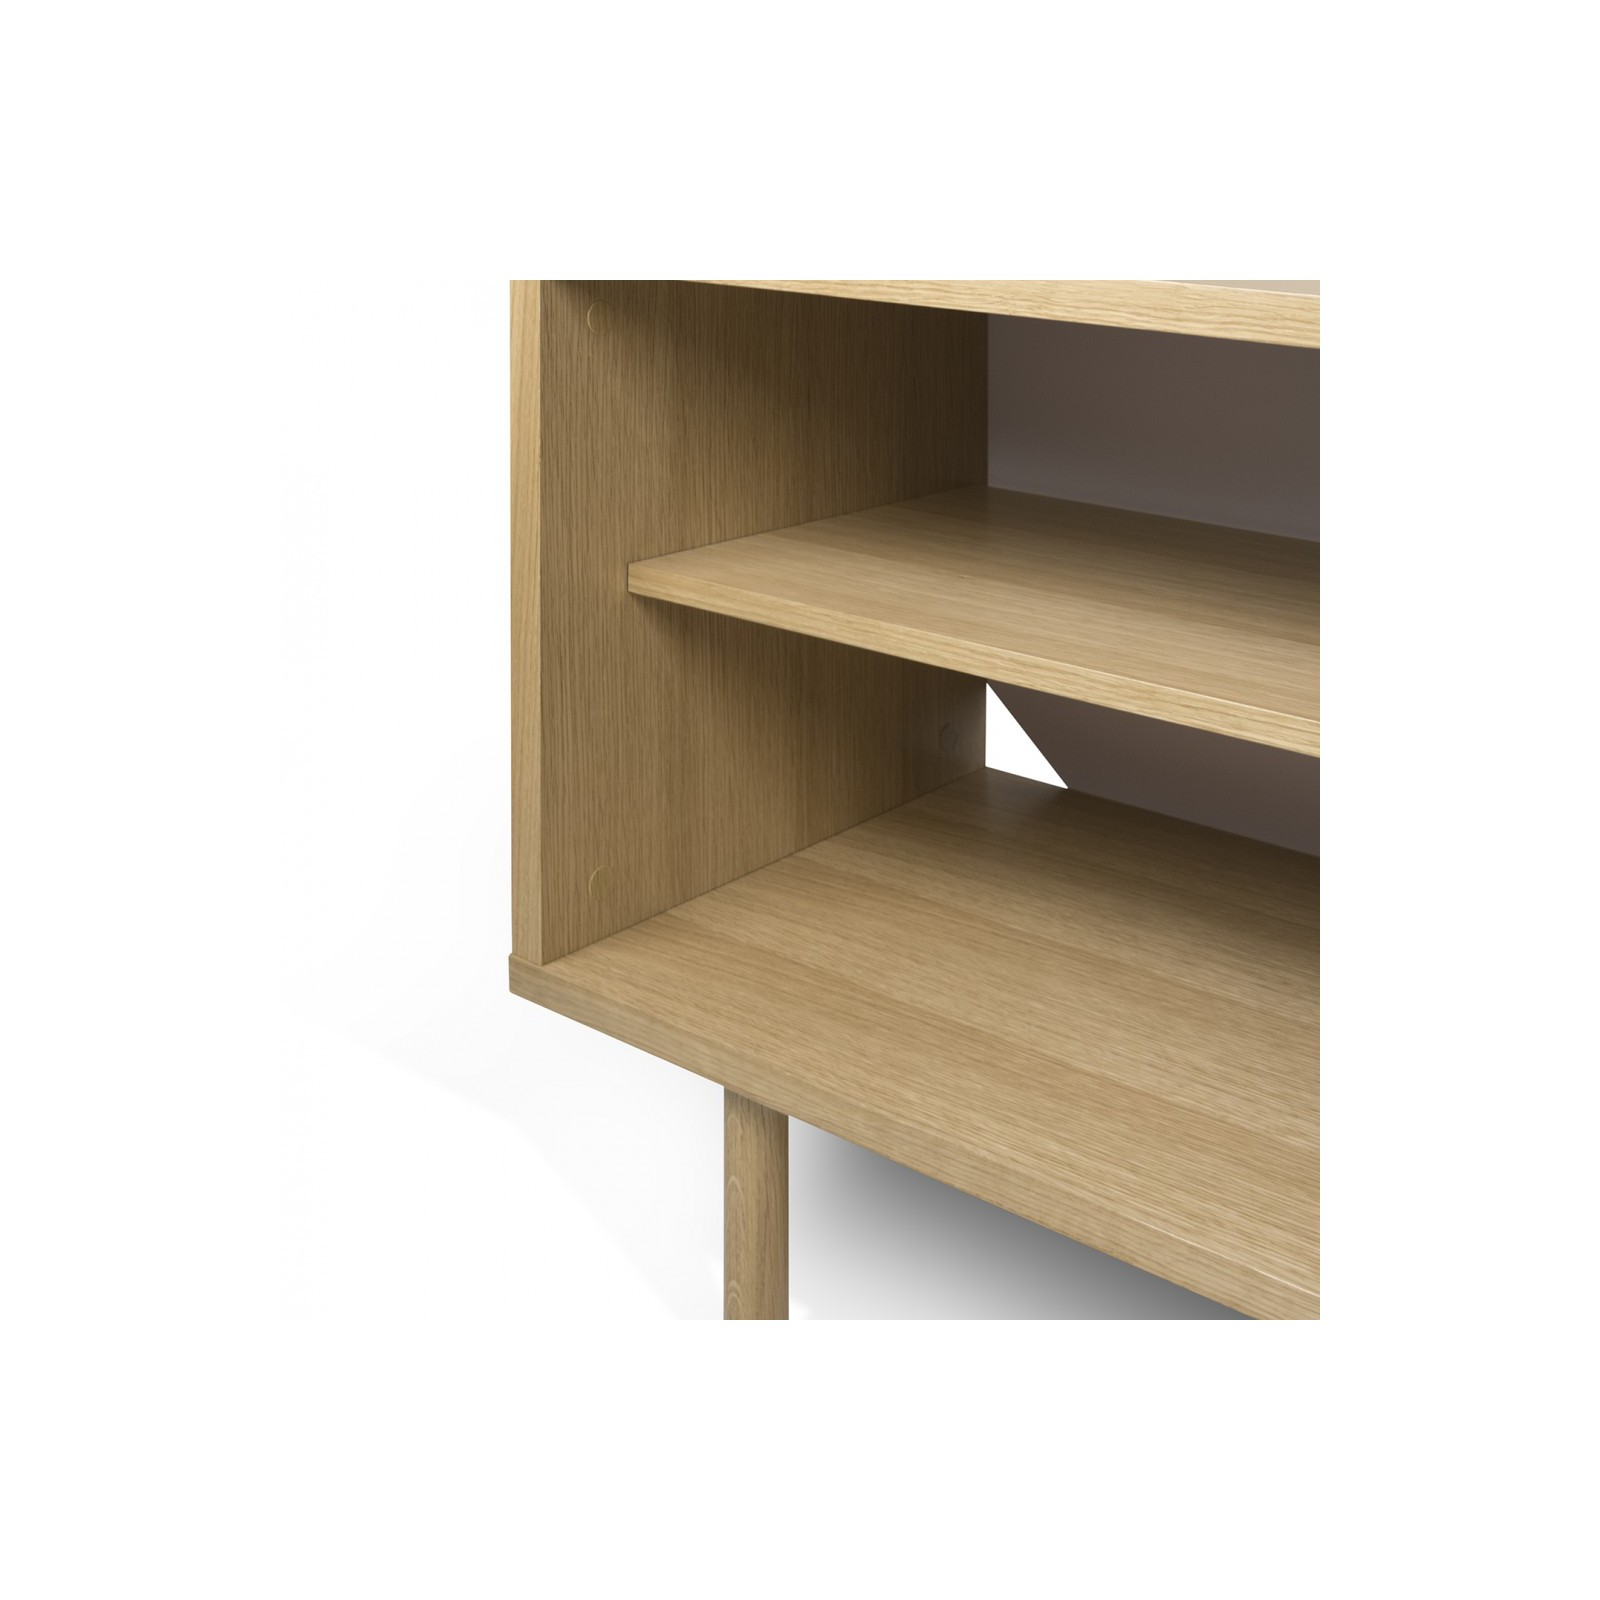 Meuble tv danois blanc et bois arne concept for Meuble tv blanc et bois